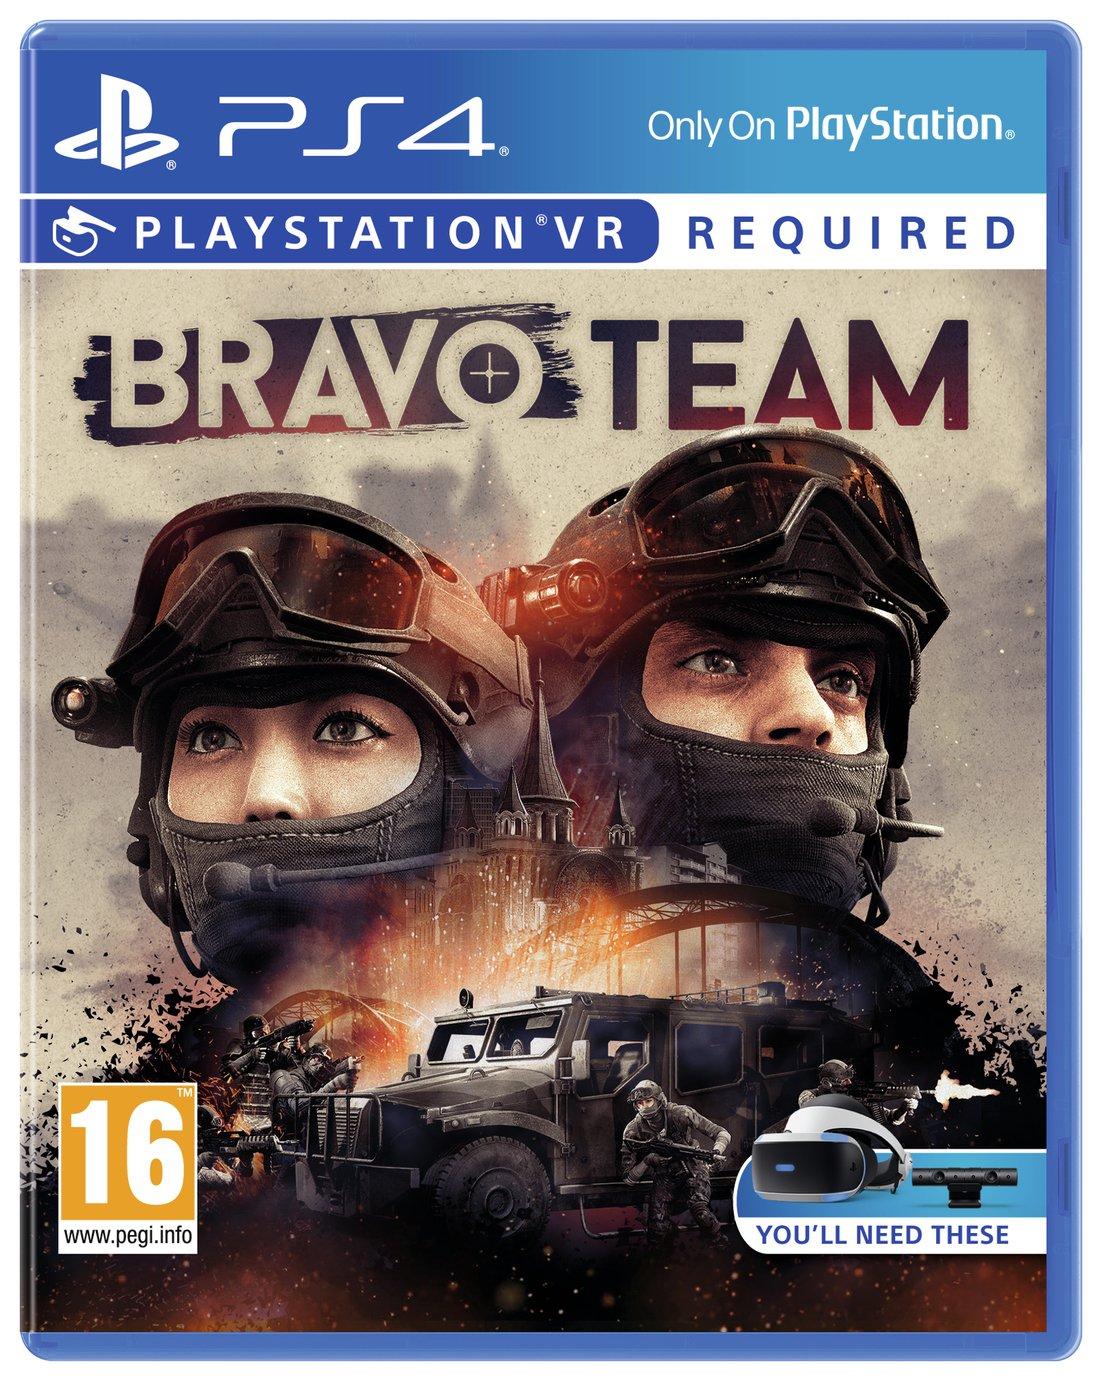 Image of Bravo Team PS4 VR Pre-Order Game.